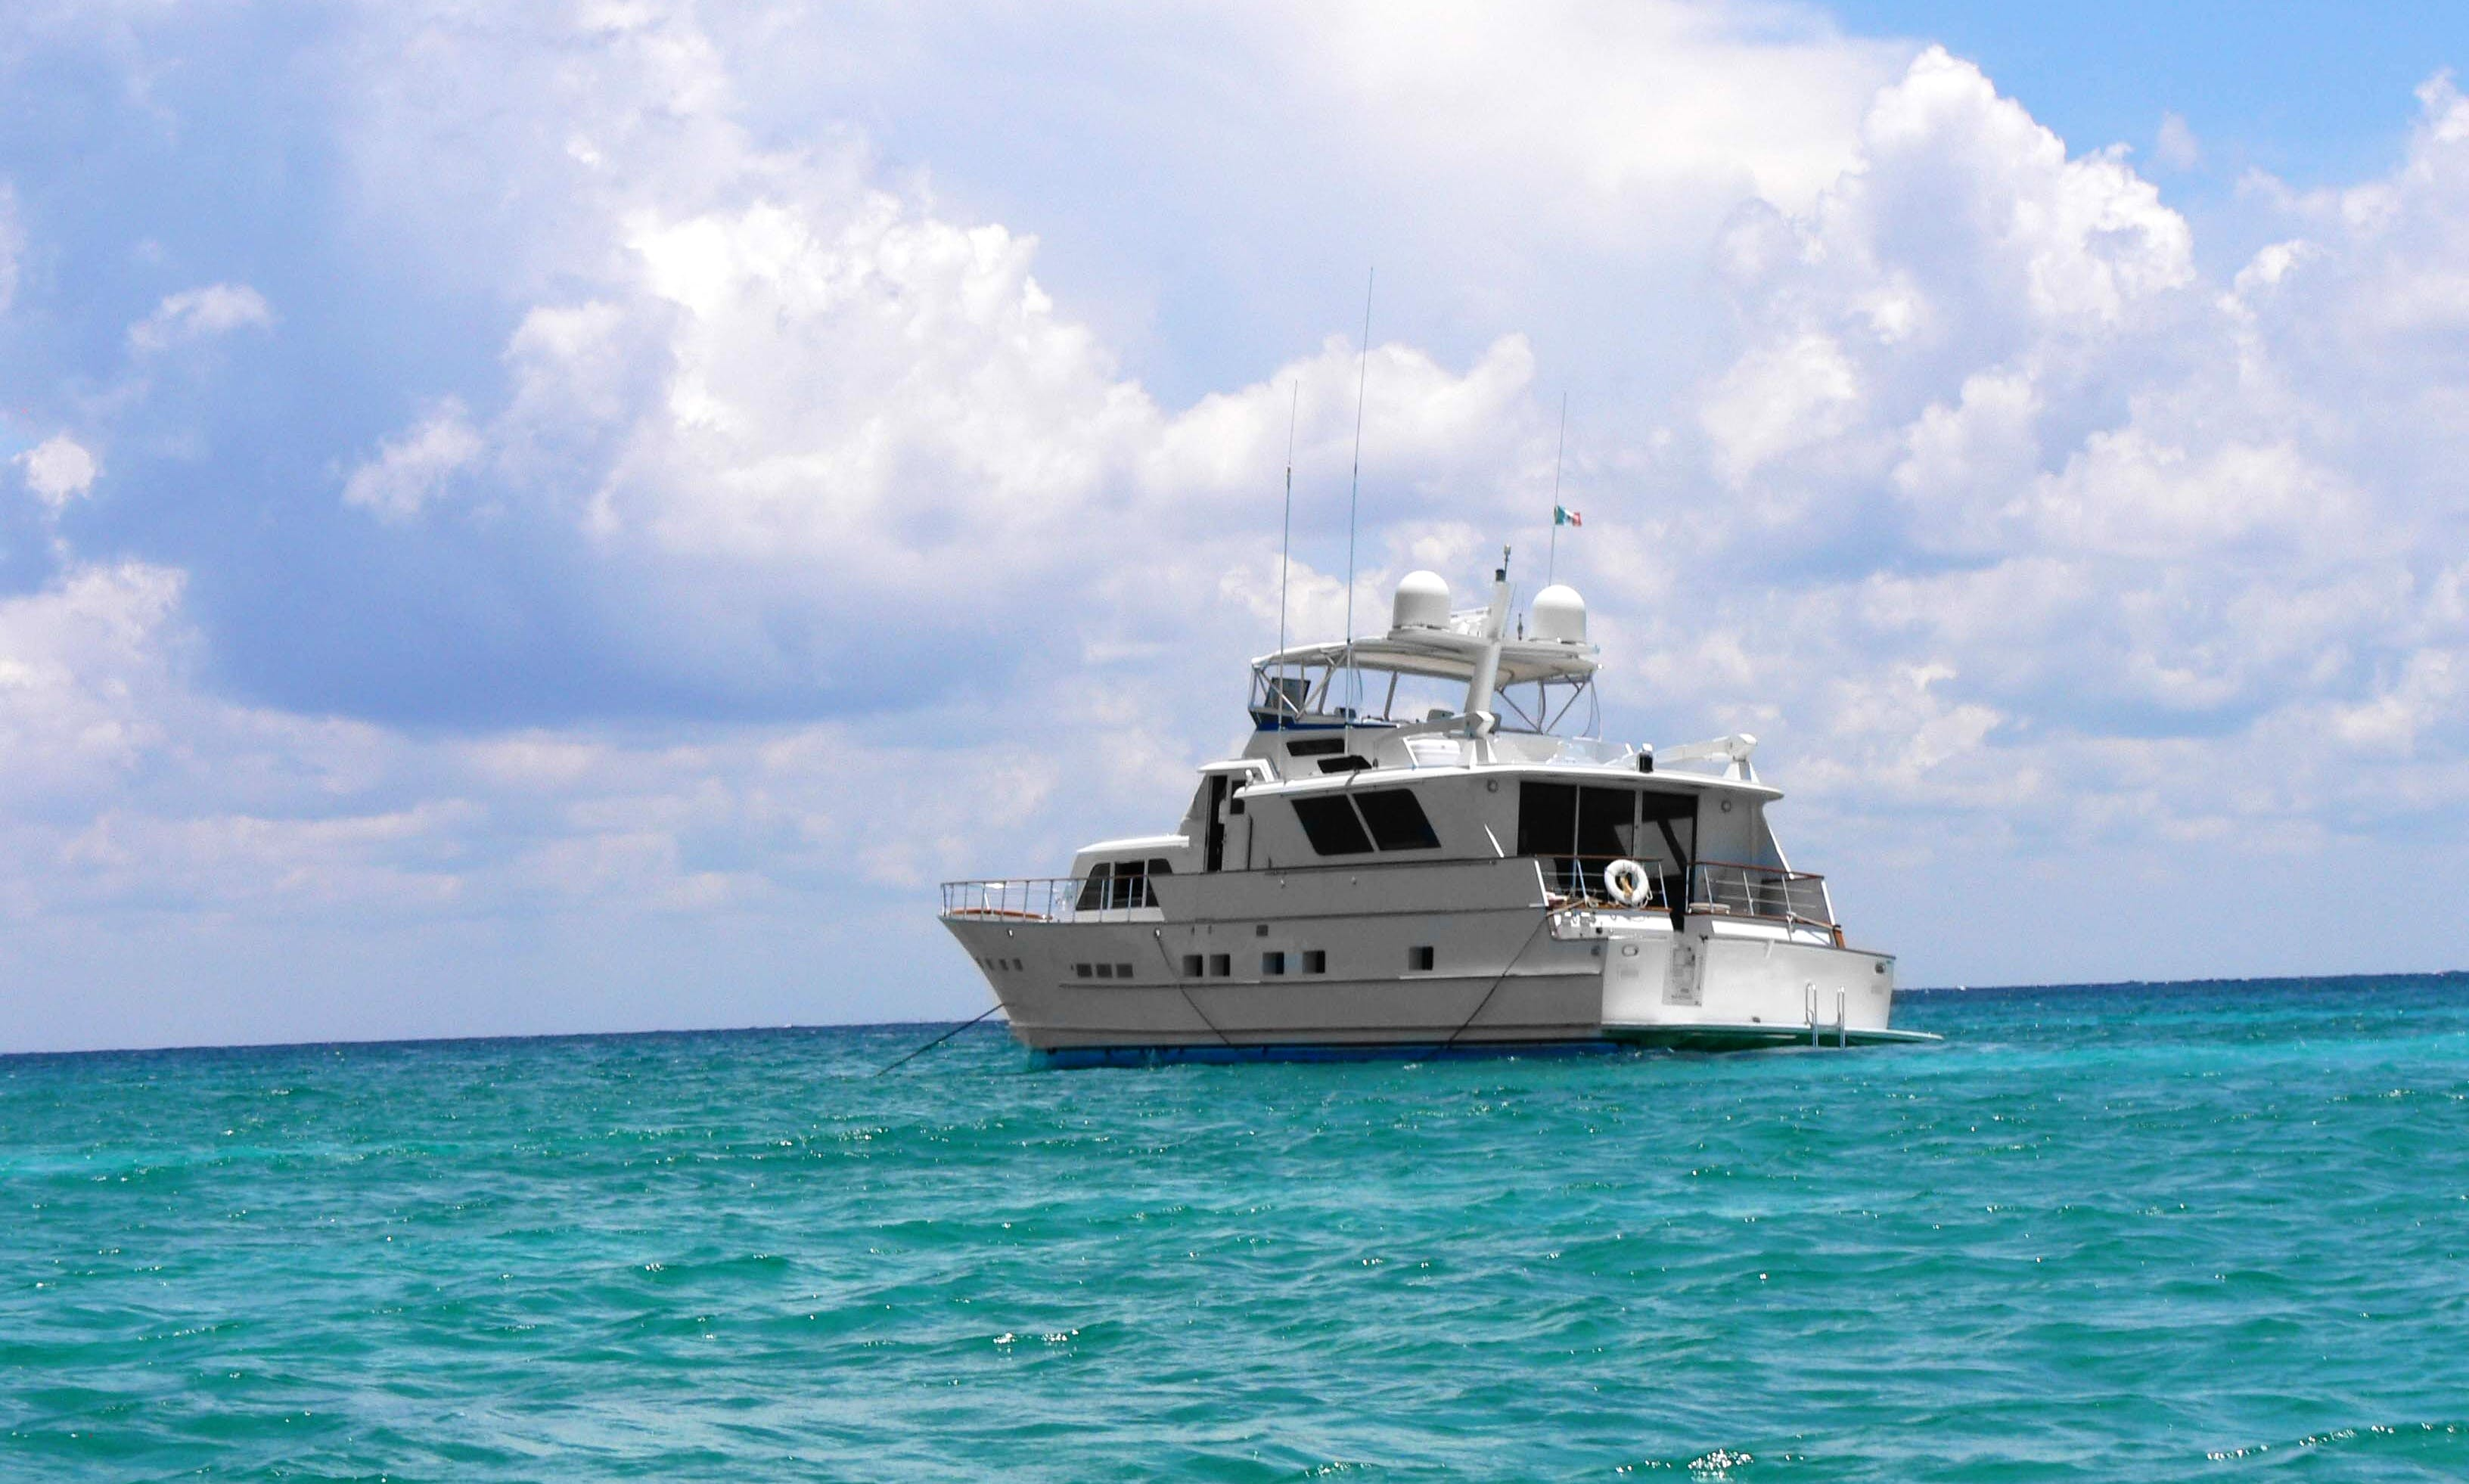 Experience a Fully Equipped 80' Power Mega Yacht near Akumal